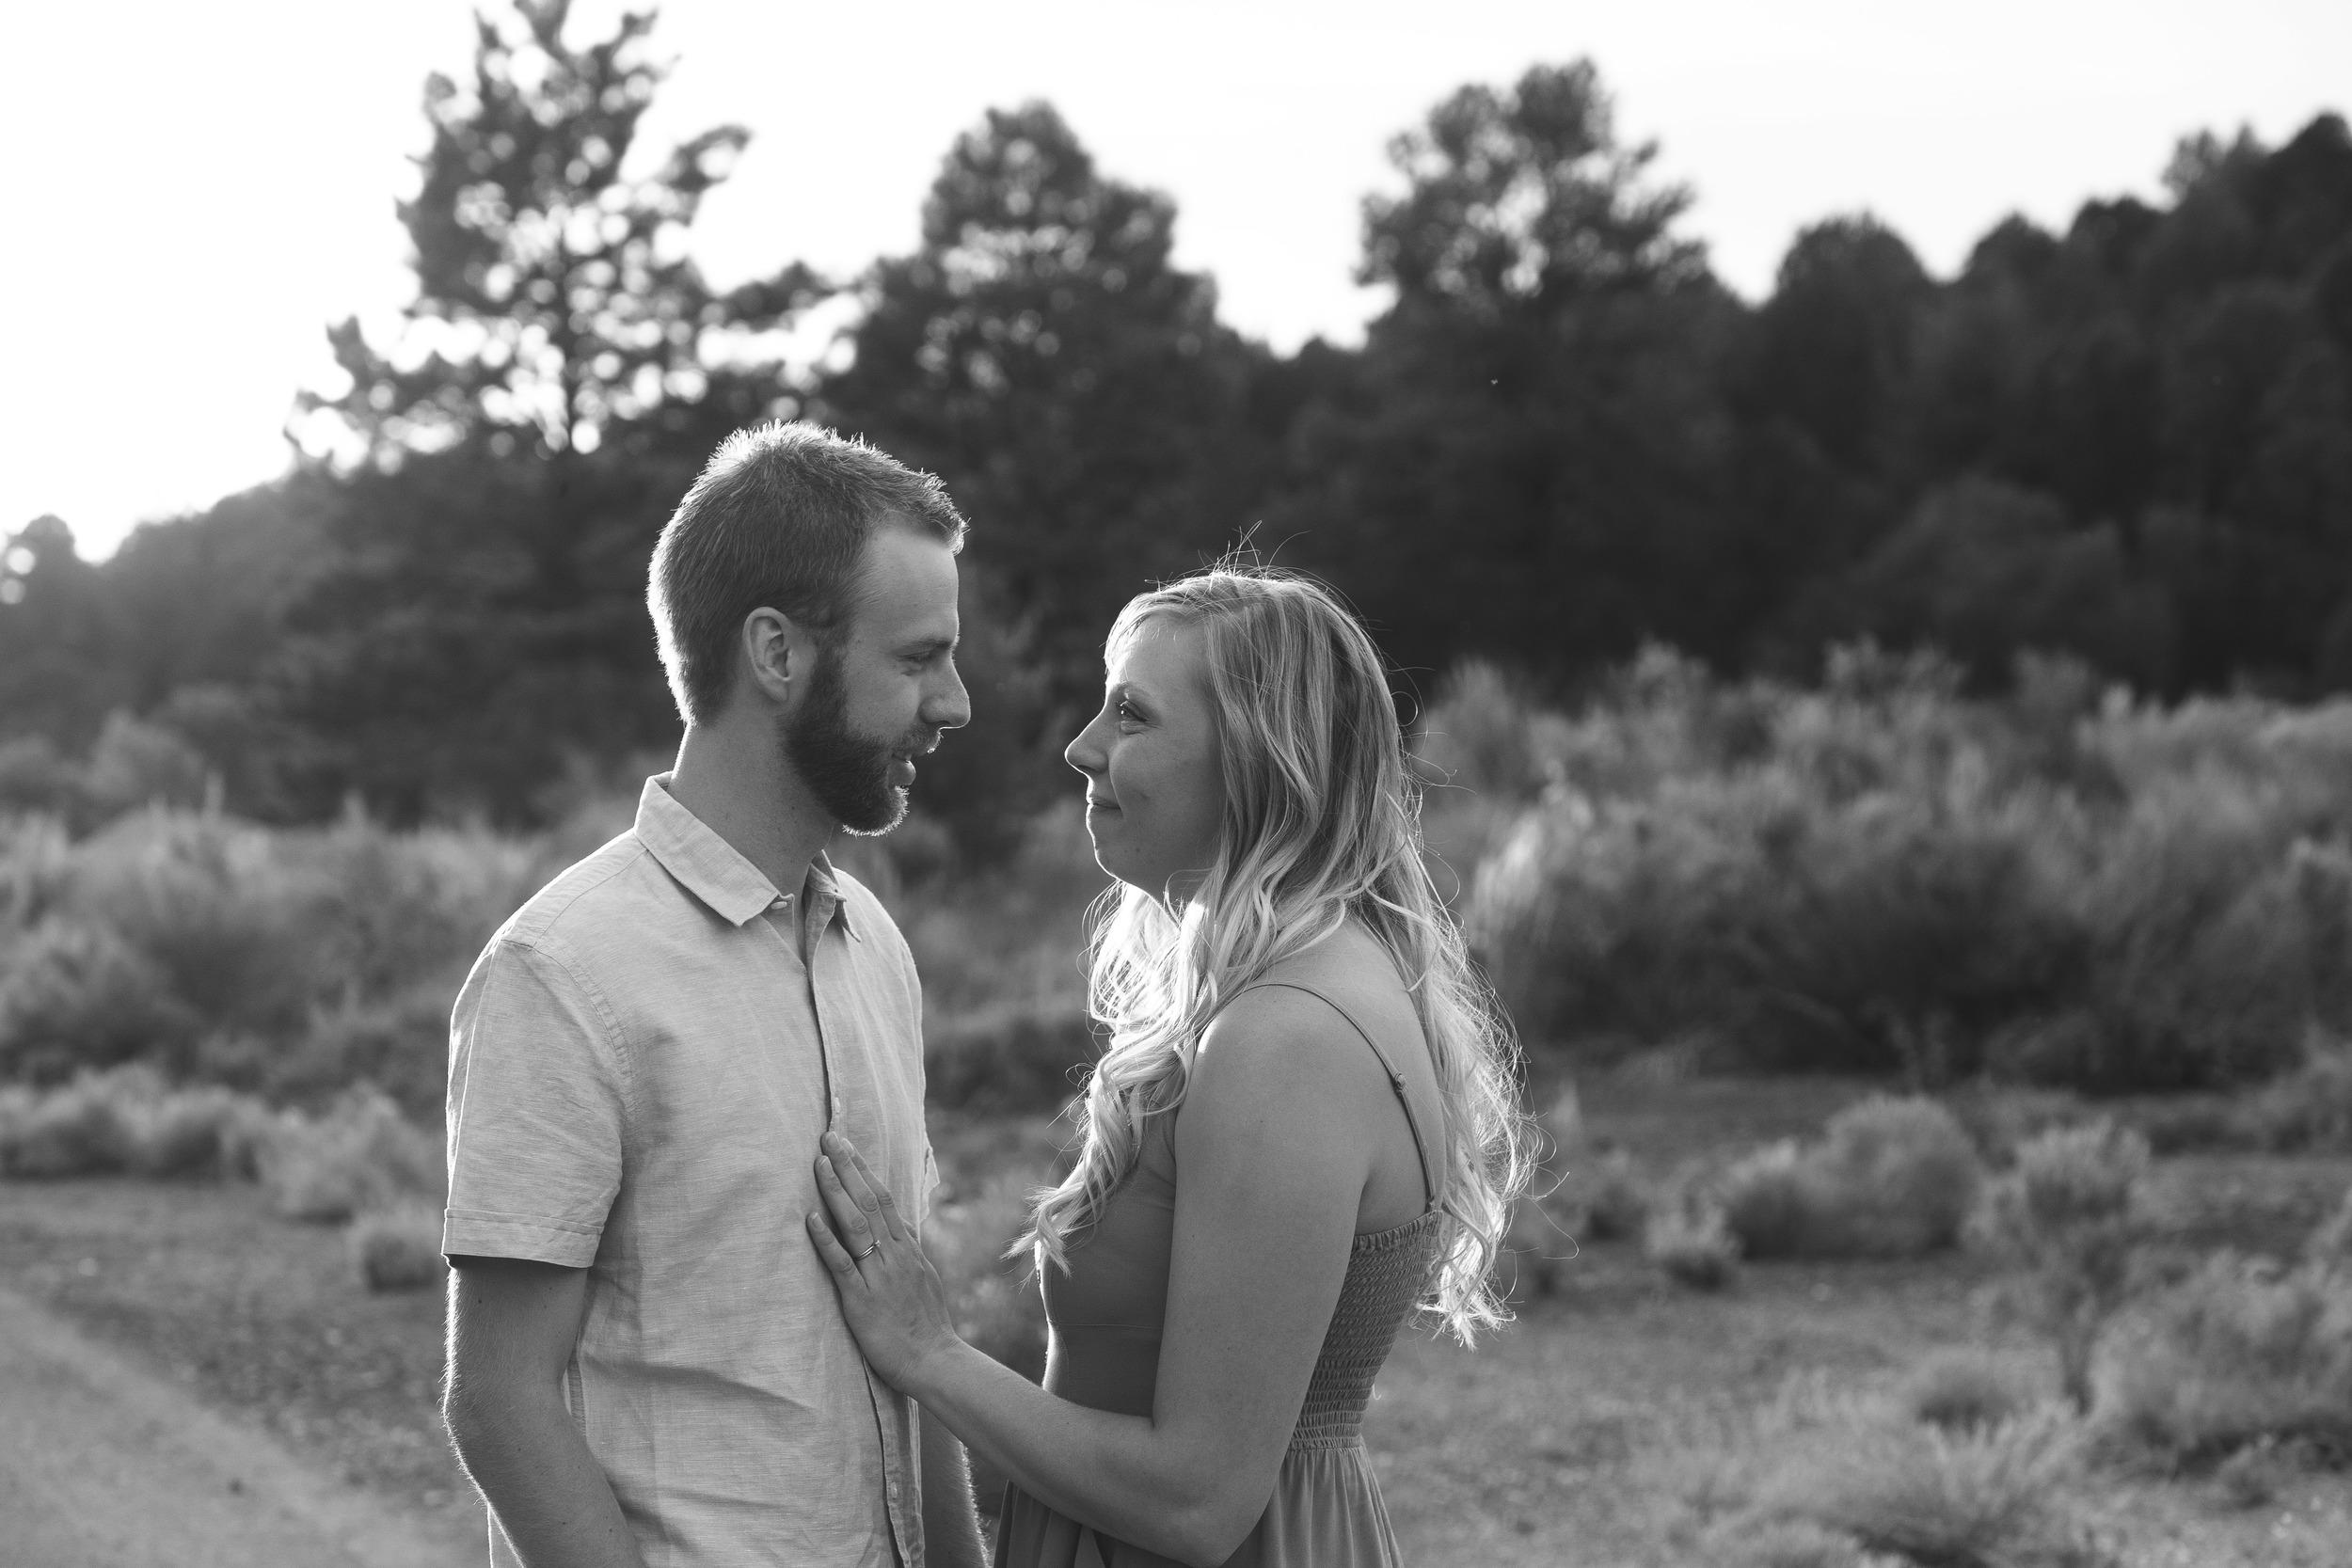 Black and White Couple's Photographer Portraits